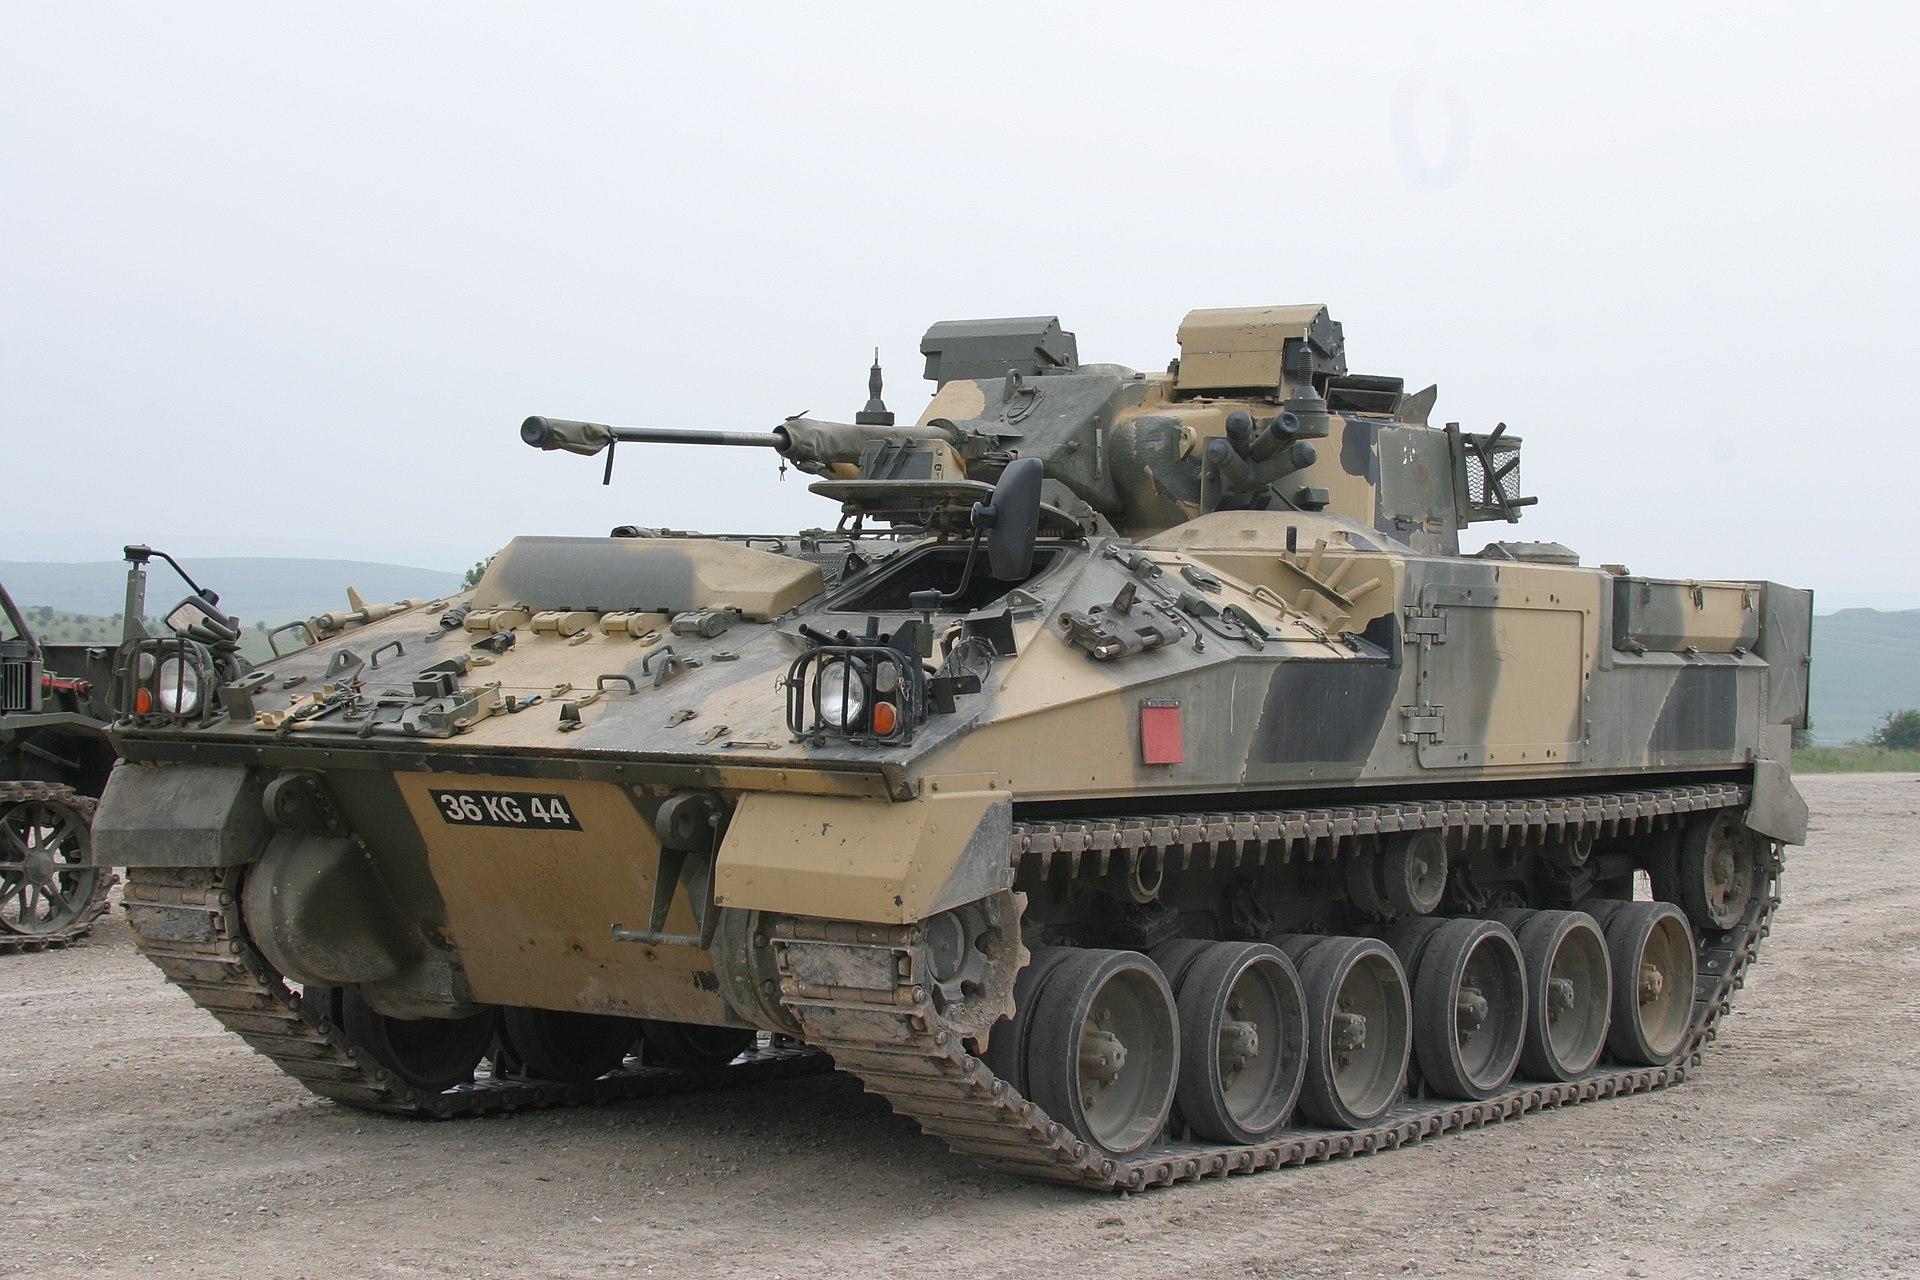 Warrior tracked armoured vehicle - Wikipedia